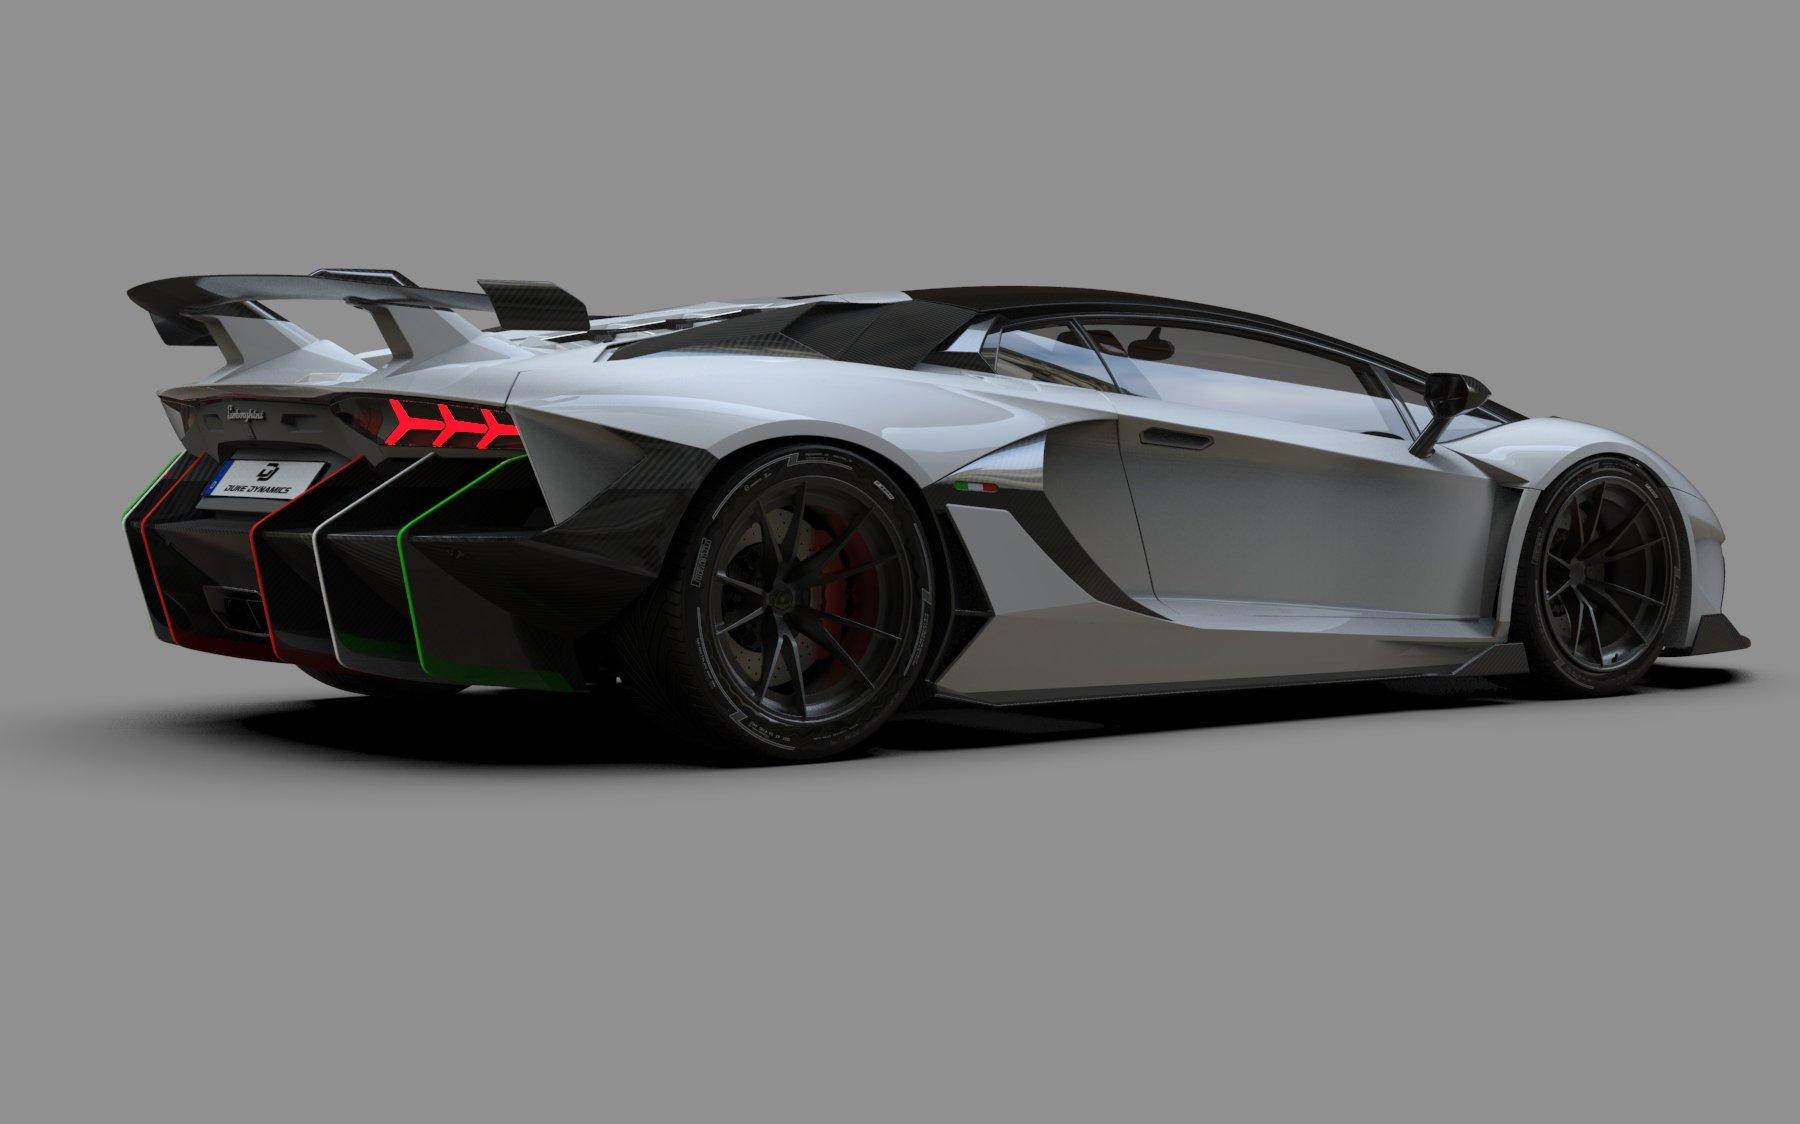 Lamborghini_Aventador_by_Duke_Dynamics_0021